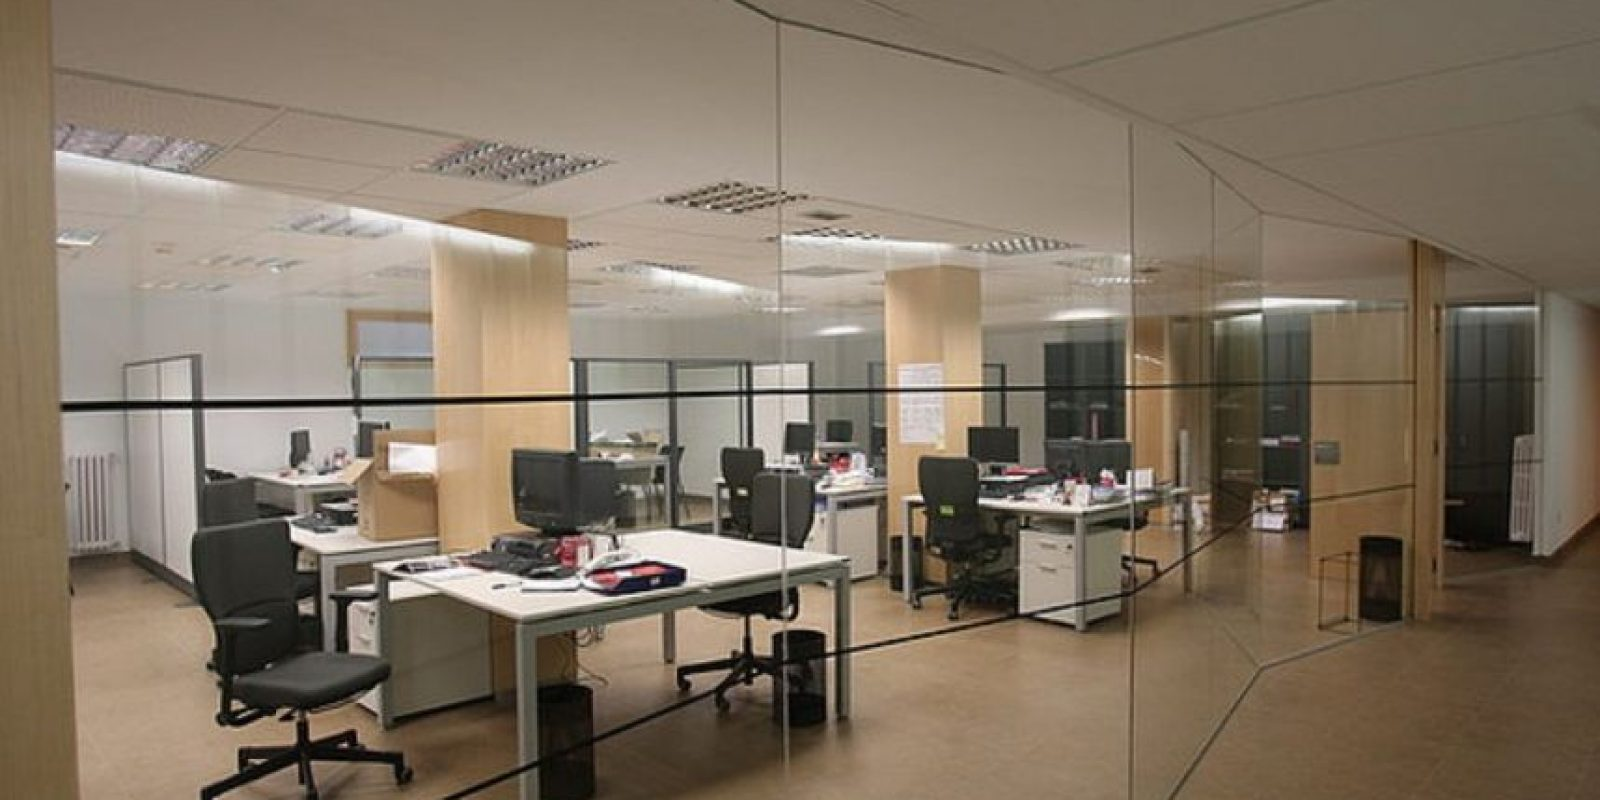 8. El microdetallista Foto:Tumblr.com/Tagged-trabajo-oficina